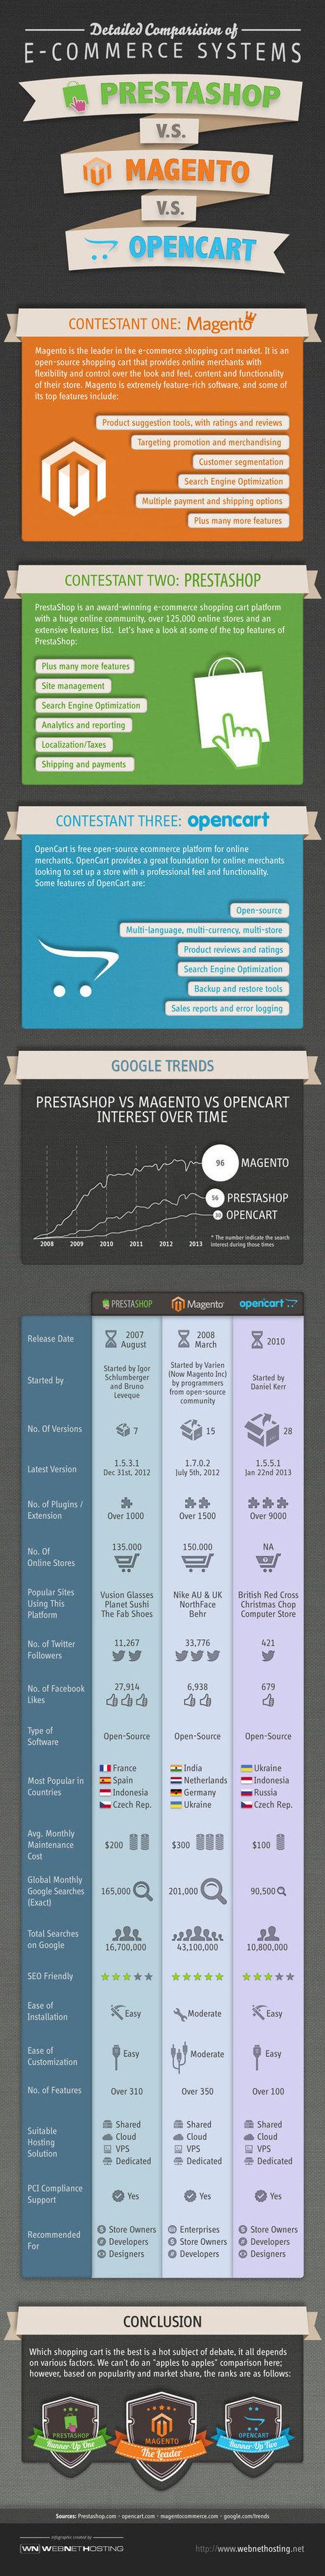 Prestashop VS Magento VS Opencart - Detailed Comparison Infographic | Open Source Ecommerce Shopping Carts | Scoop.it